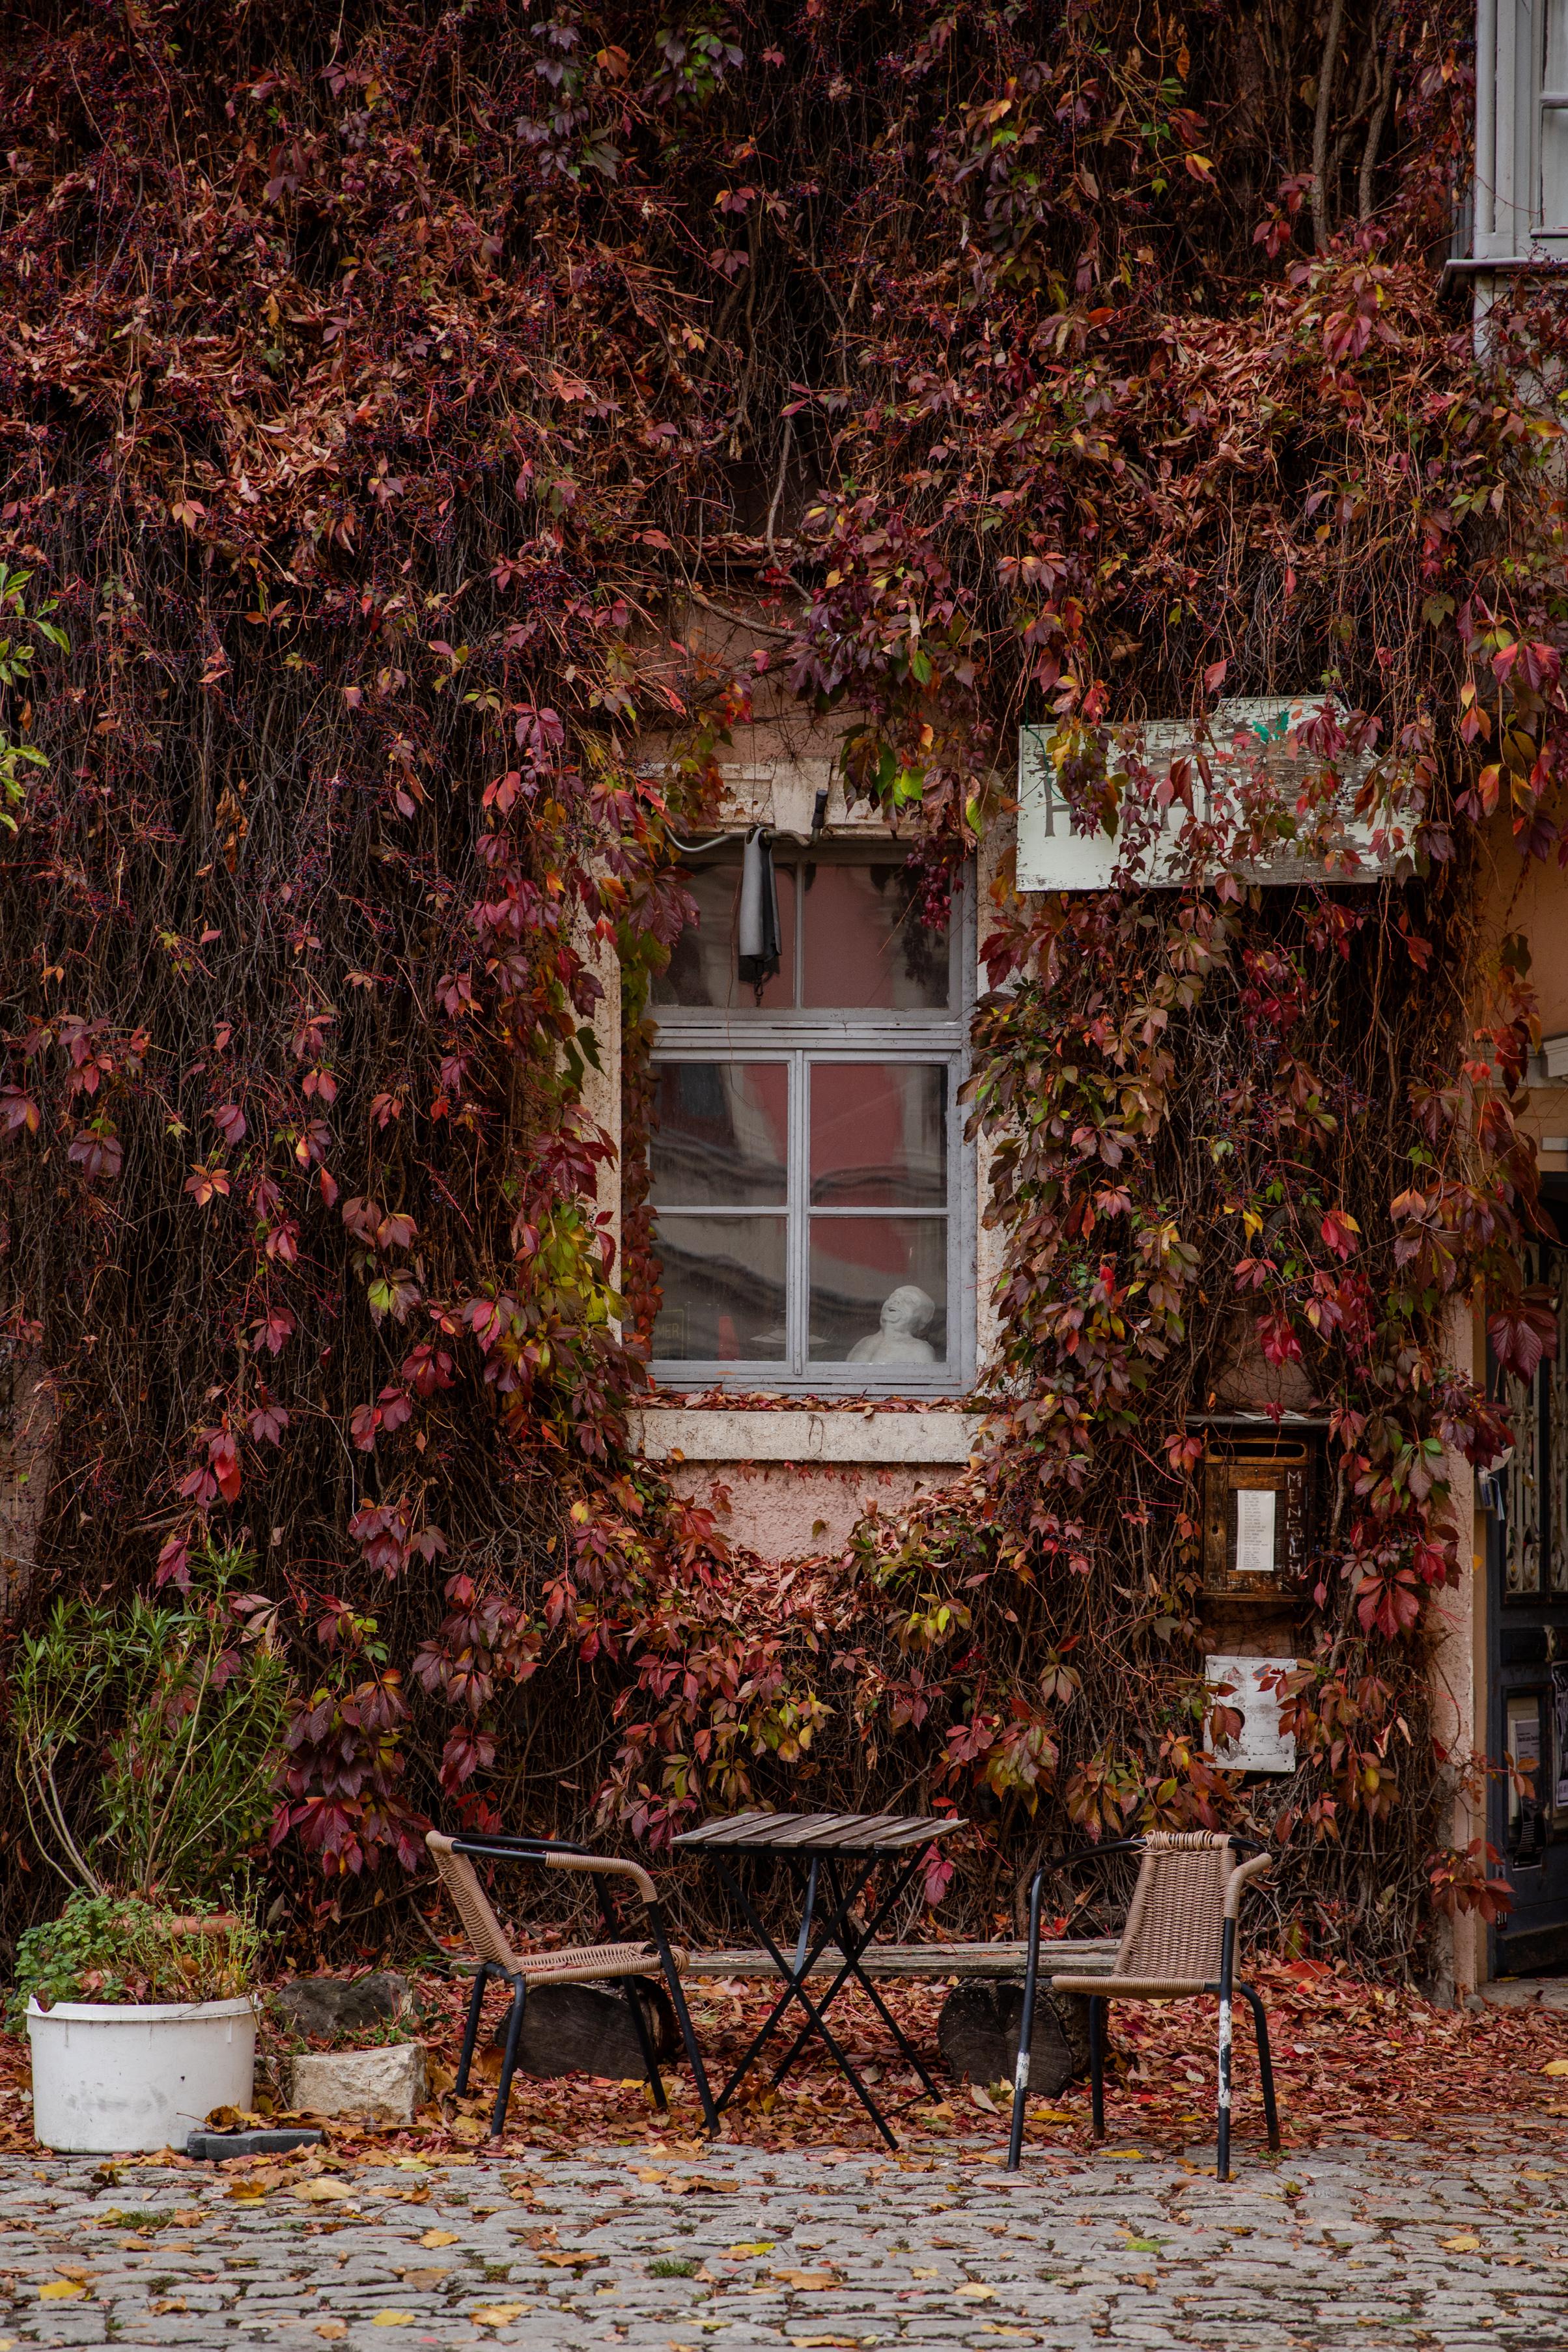 Germany-9043.jpg